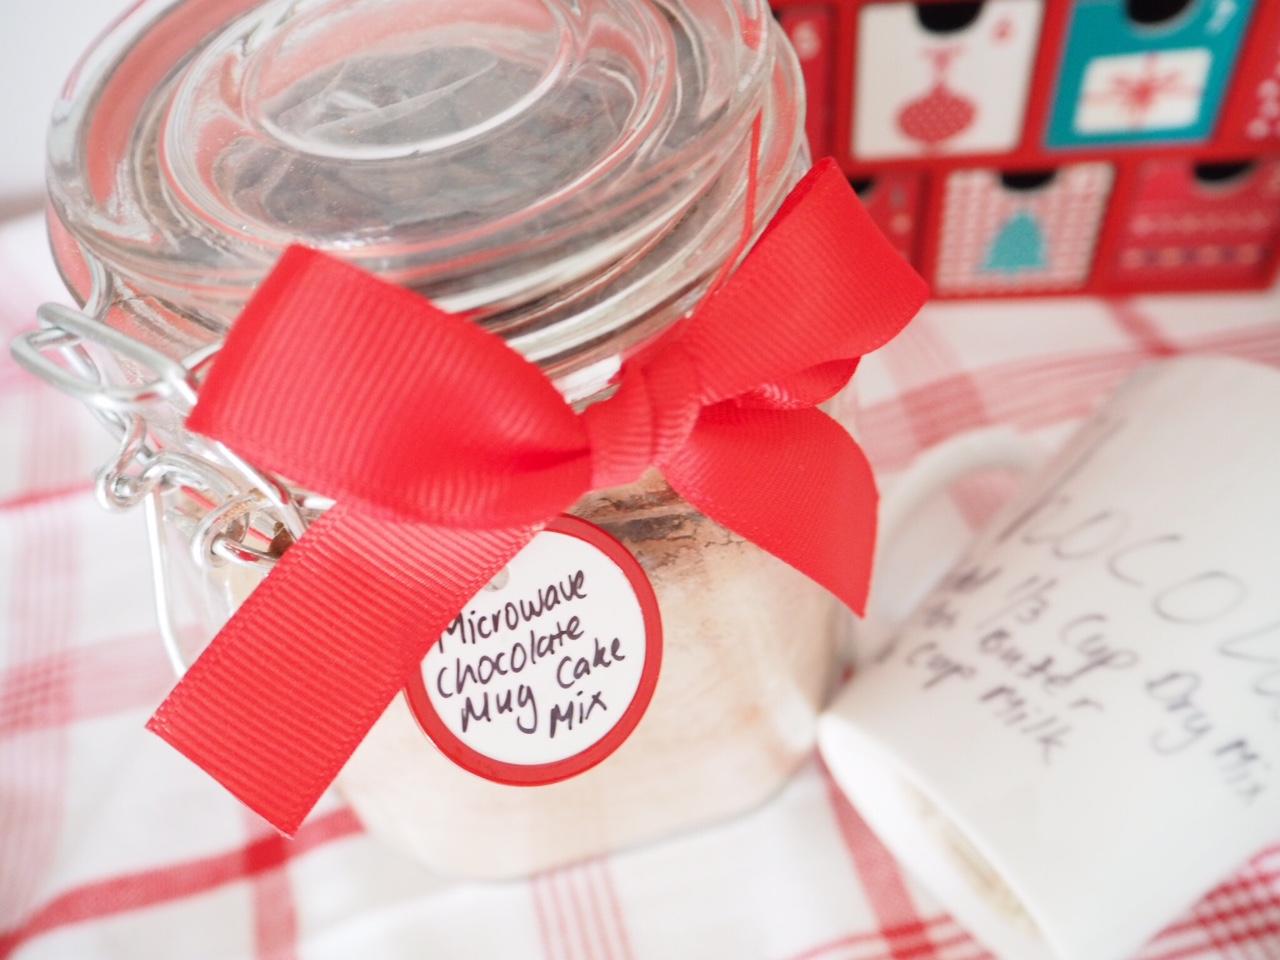 Homemade Gift - Chocolate Mug Cake Mix